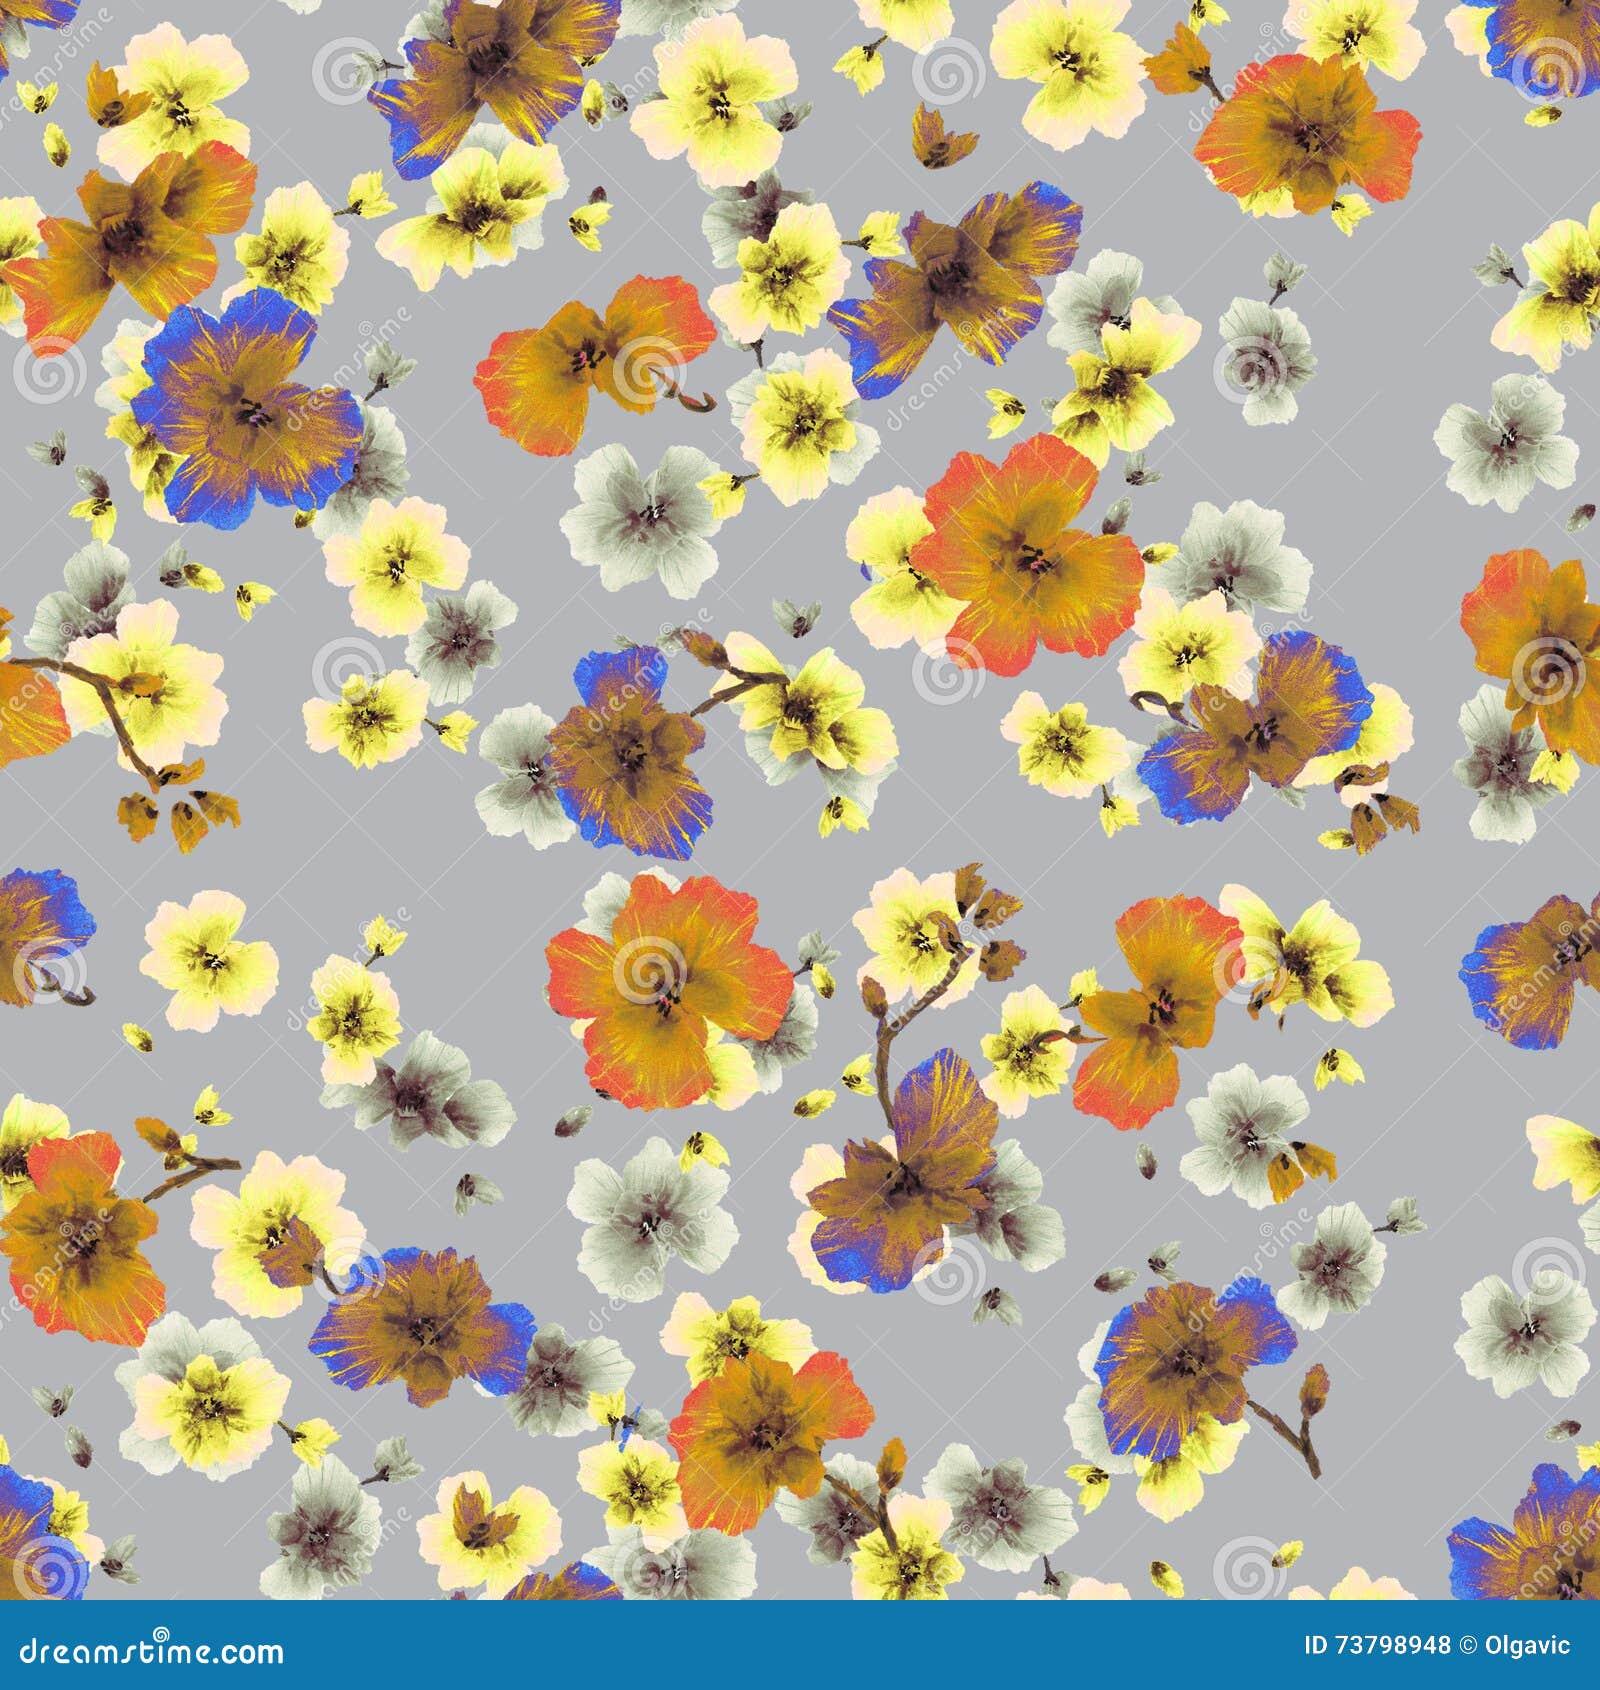 Watercolor seamless pattern orange yellow blue flowers on a gray download watercolor seamless pattern orange yellow blue flowers on a gray background stock illustration mightylinksfo